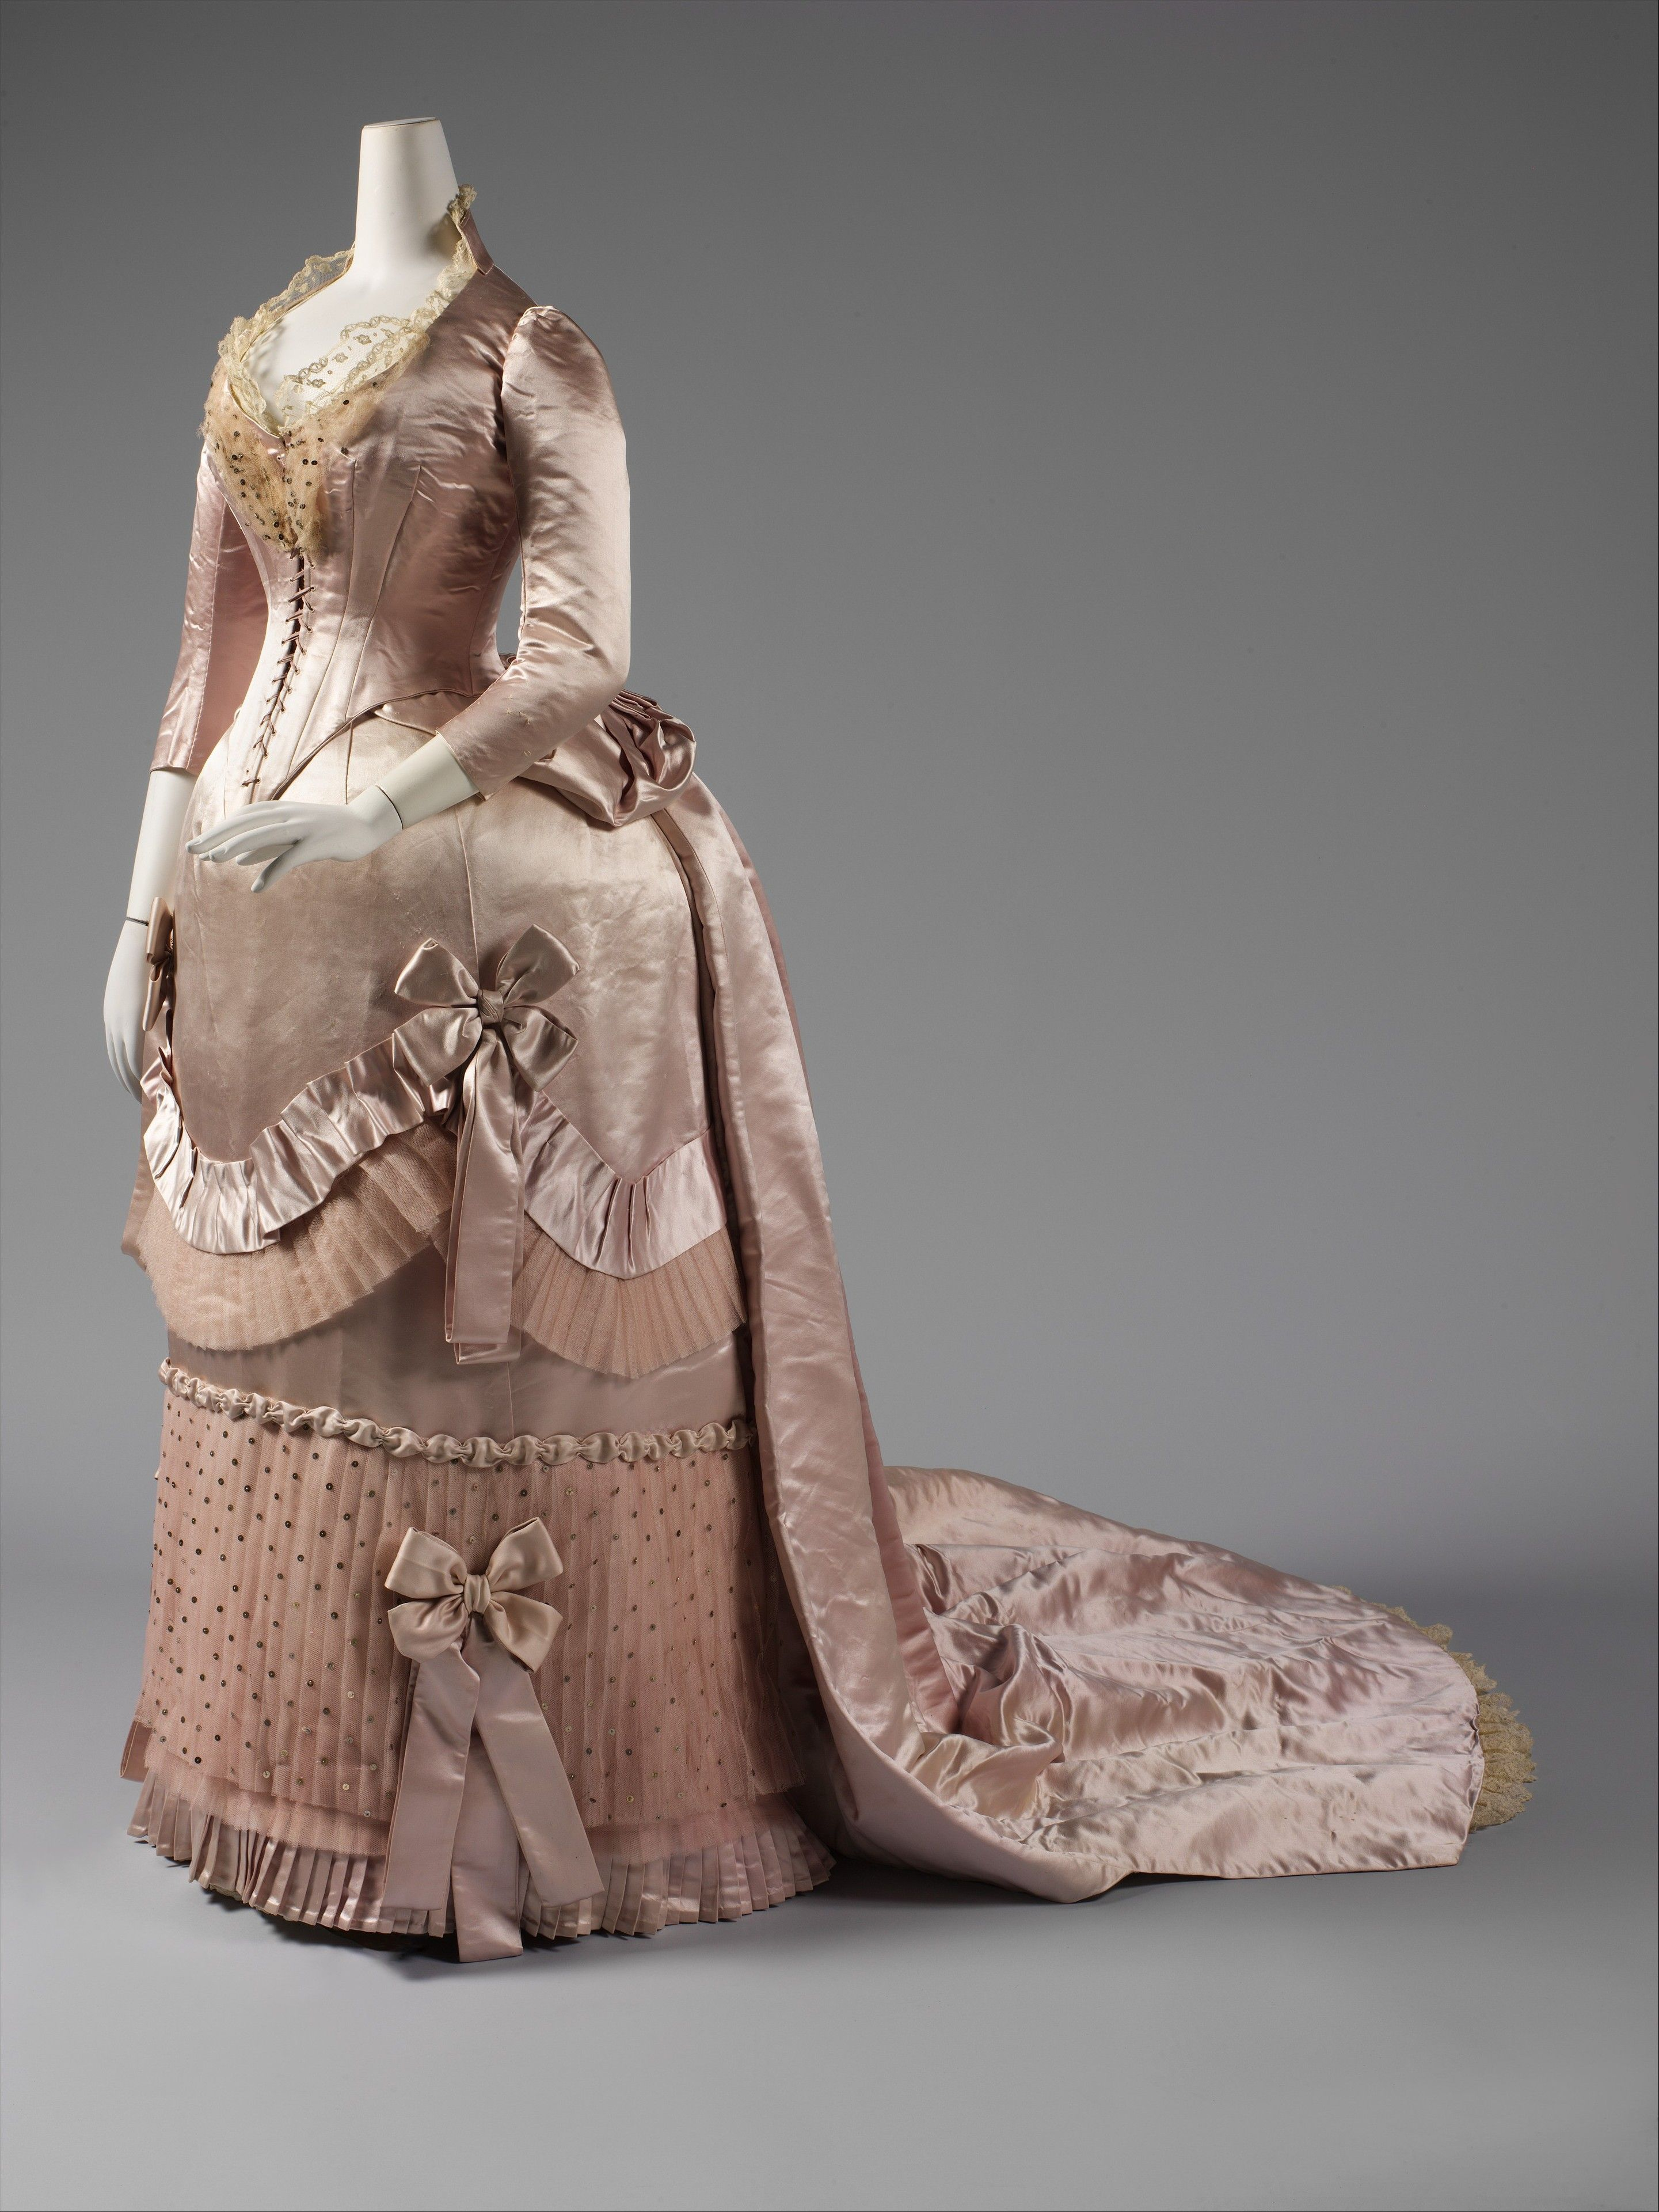 DP218948.jpg 2,882×3,842 pixels Charles Frederic Worth Court Presentation dress 1888